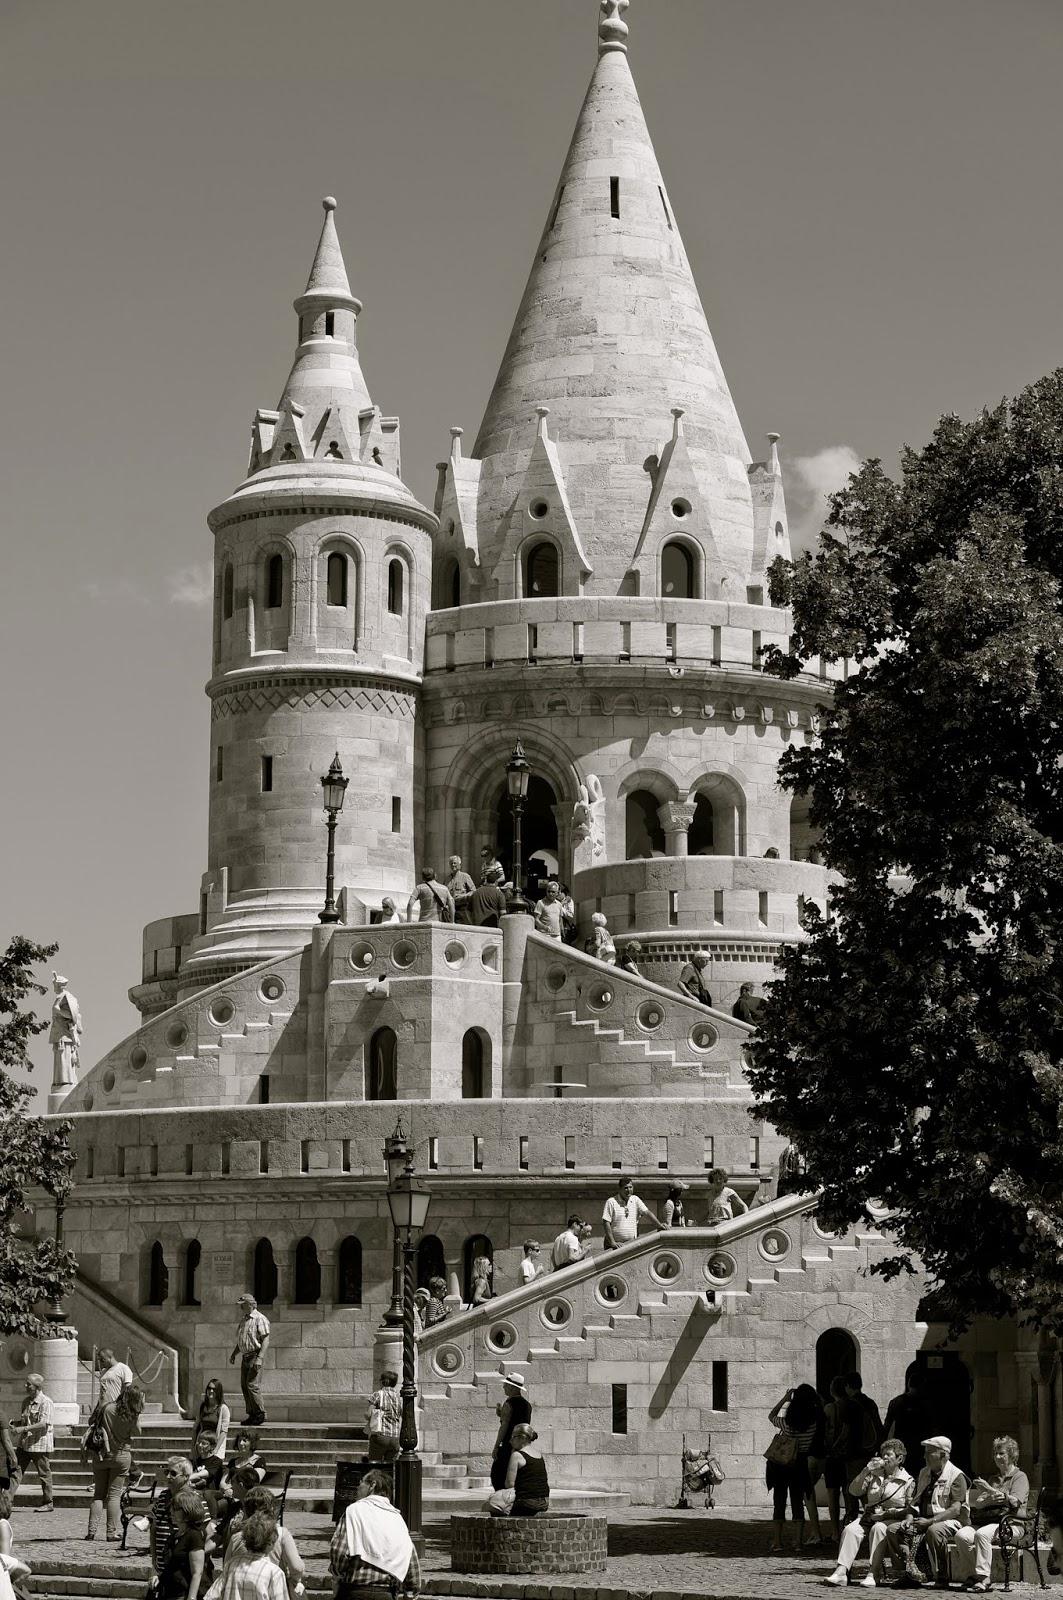 Budapest Hungary,Castle Hill,Chain Bridge,Elizabeth Bridge,Fishermens Bastion,Heroes Square,Palvix Restaurant,The Matthias Church,Danube River